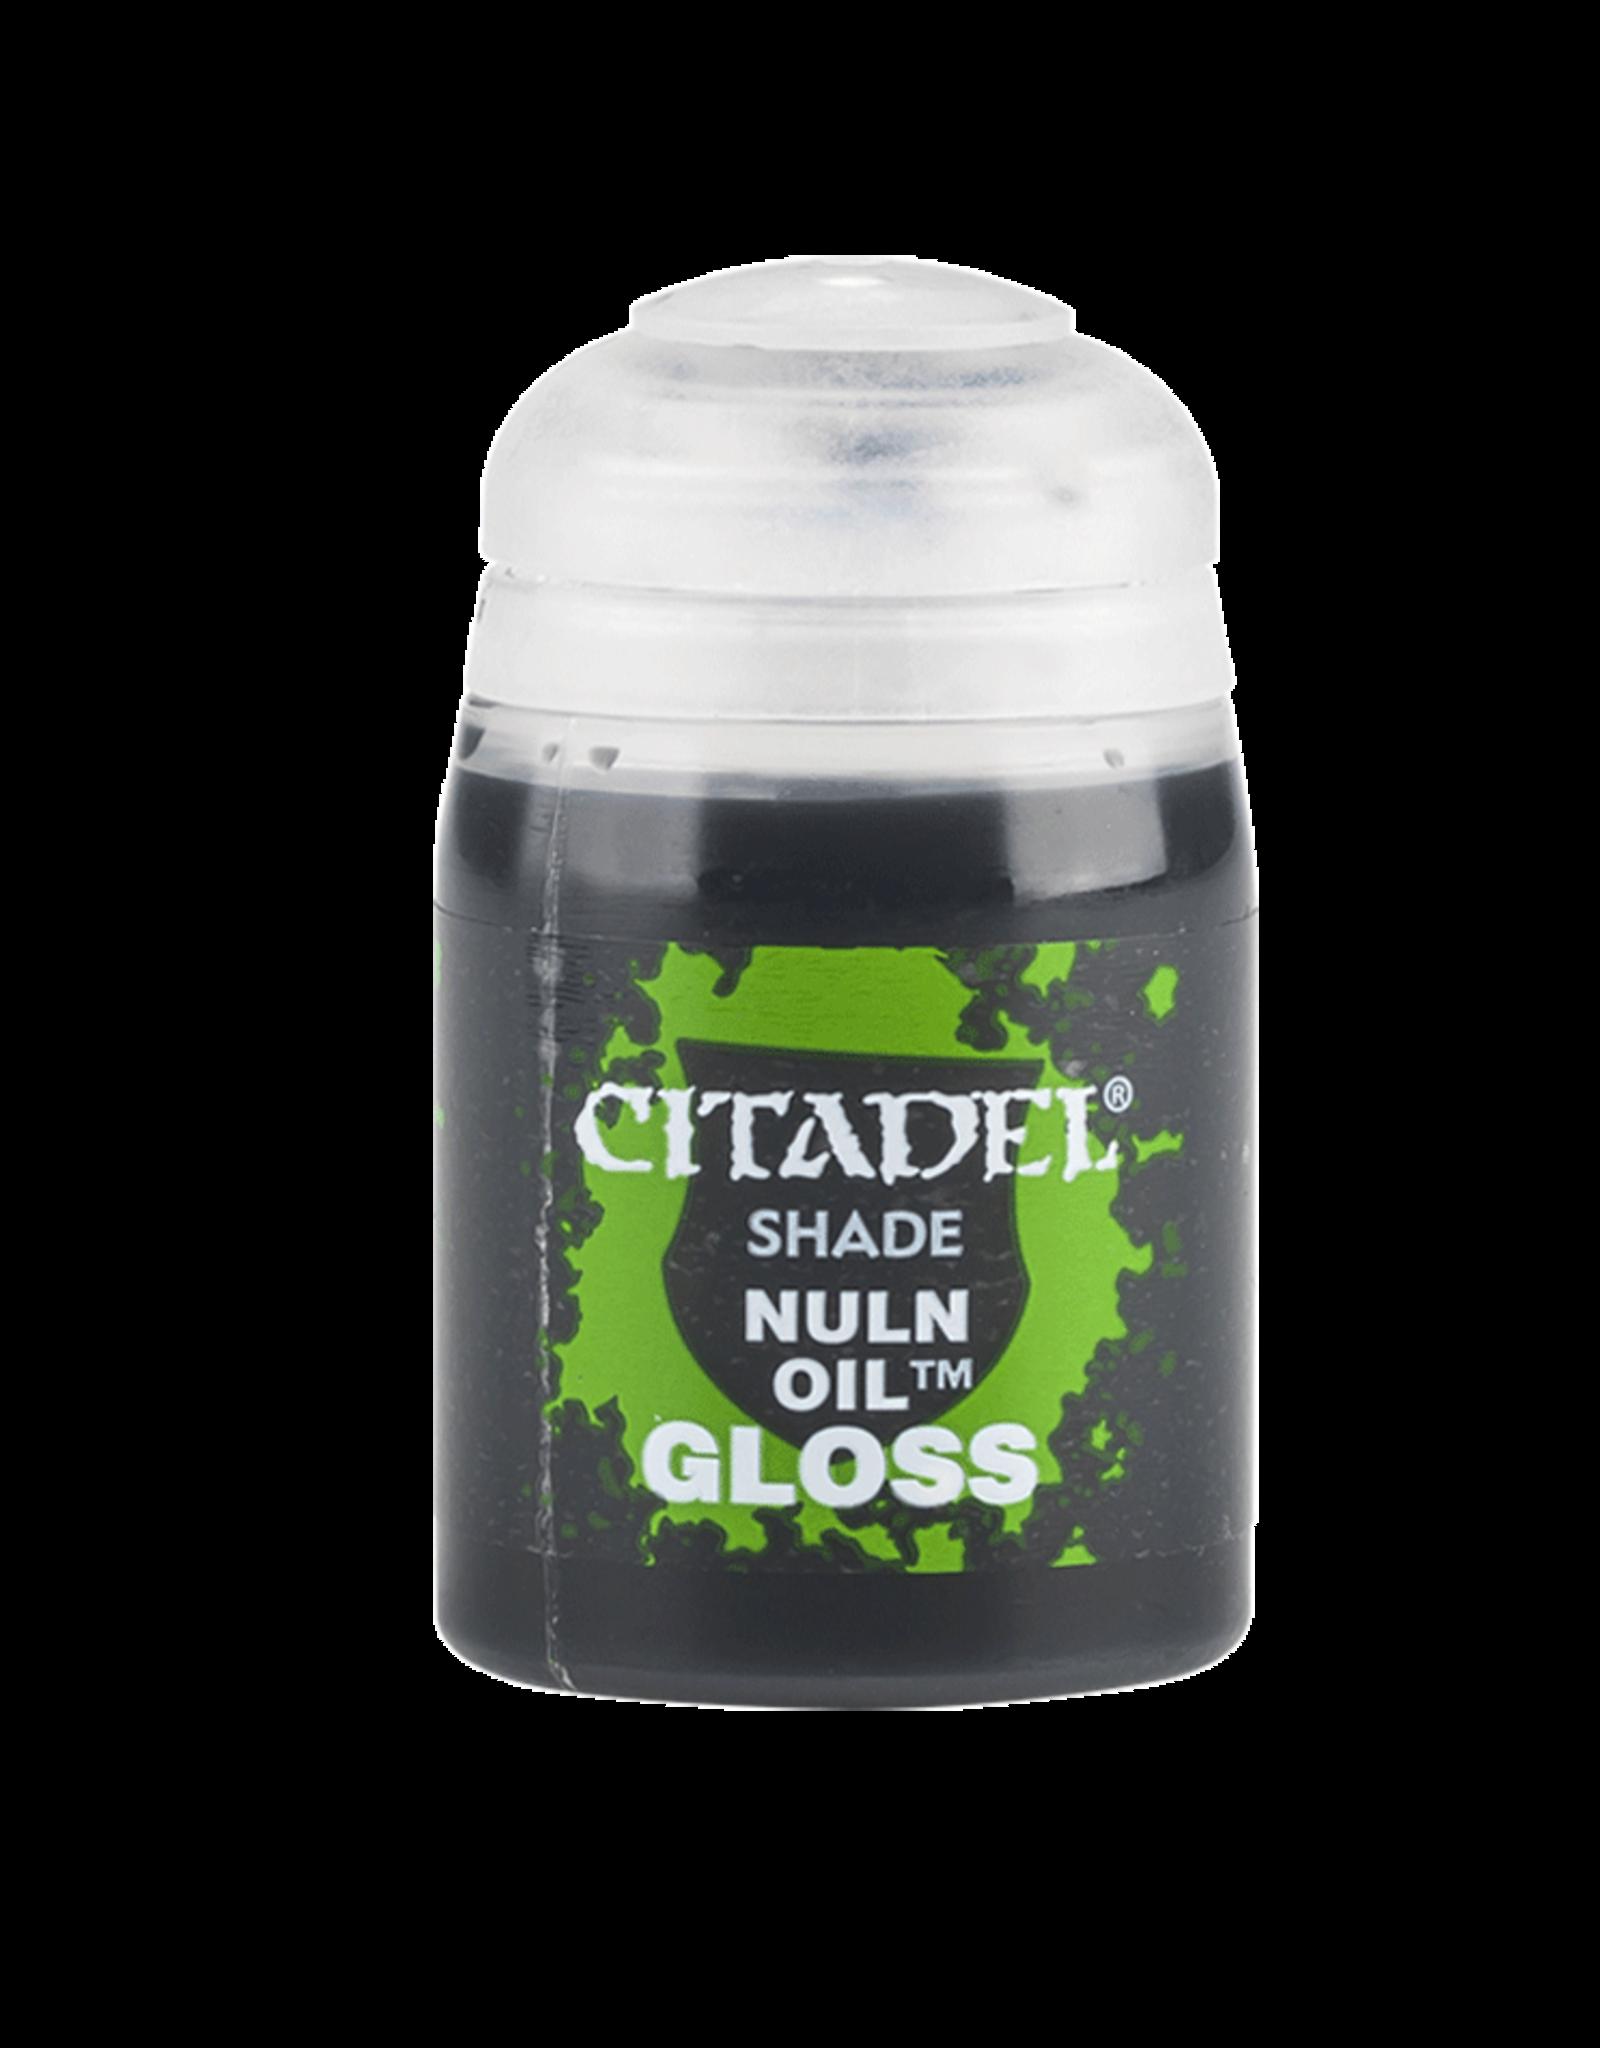 Games Workshop Citadel Shade: Nuln Oil Gloss (24ml)